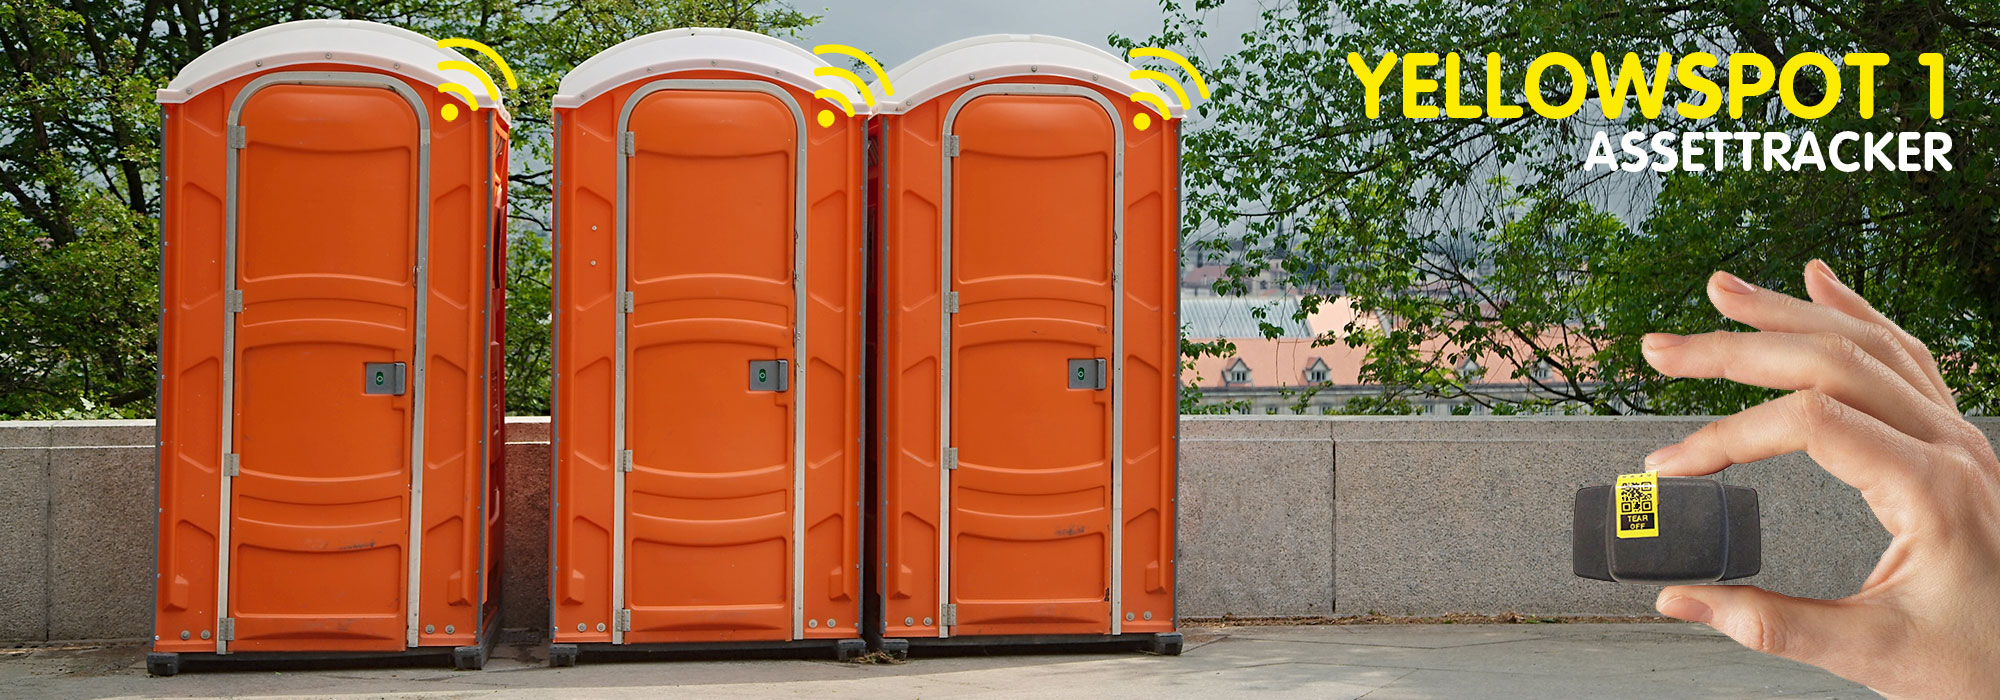 Spotmaster Assettracker Yellowspot 1 gebruik voor mobiele toiletten